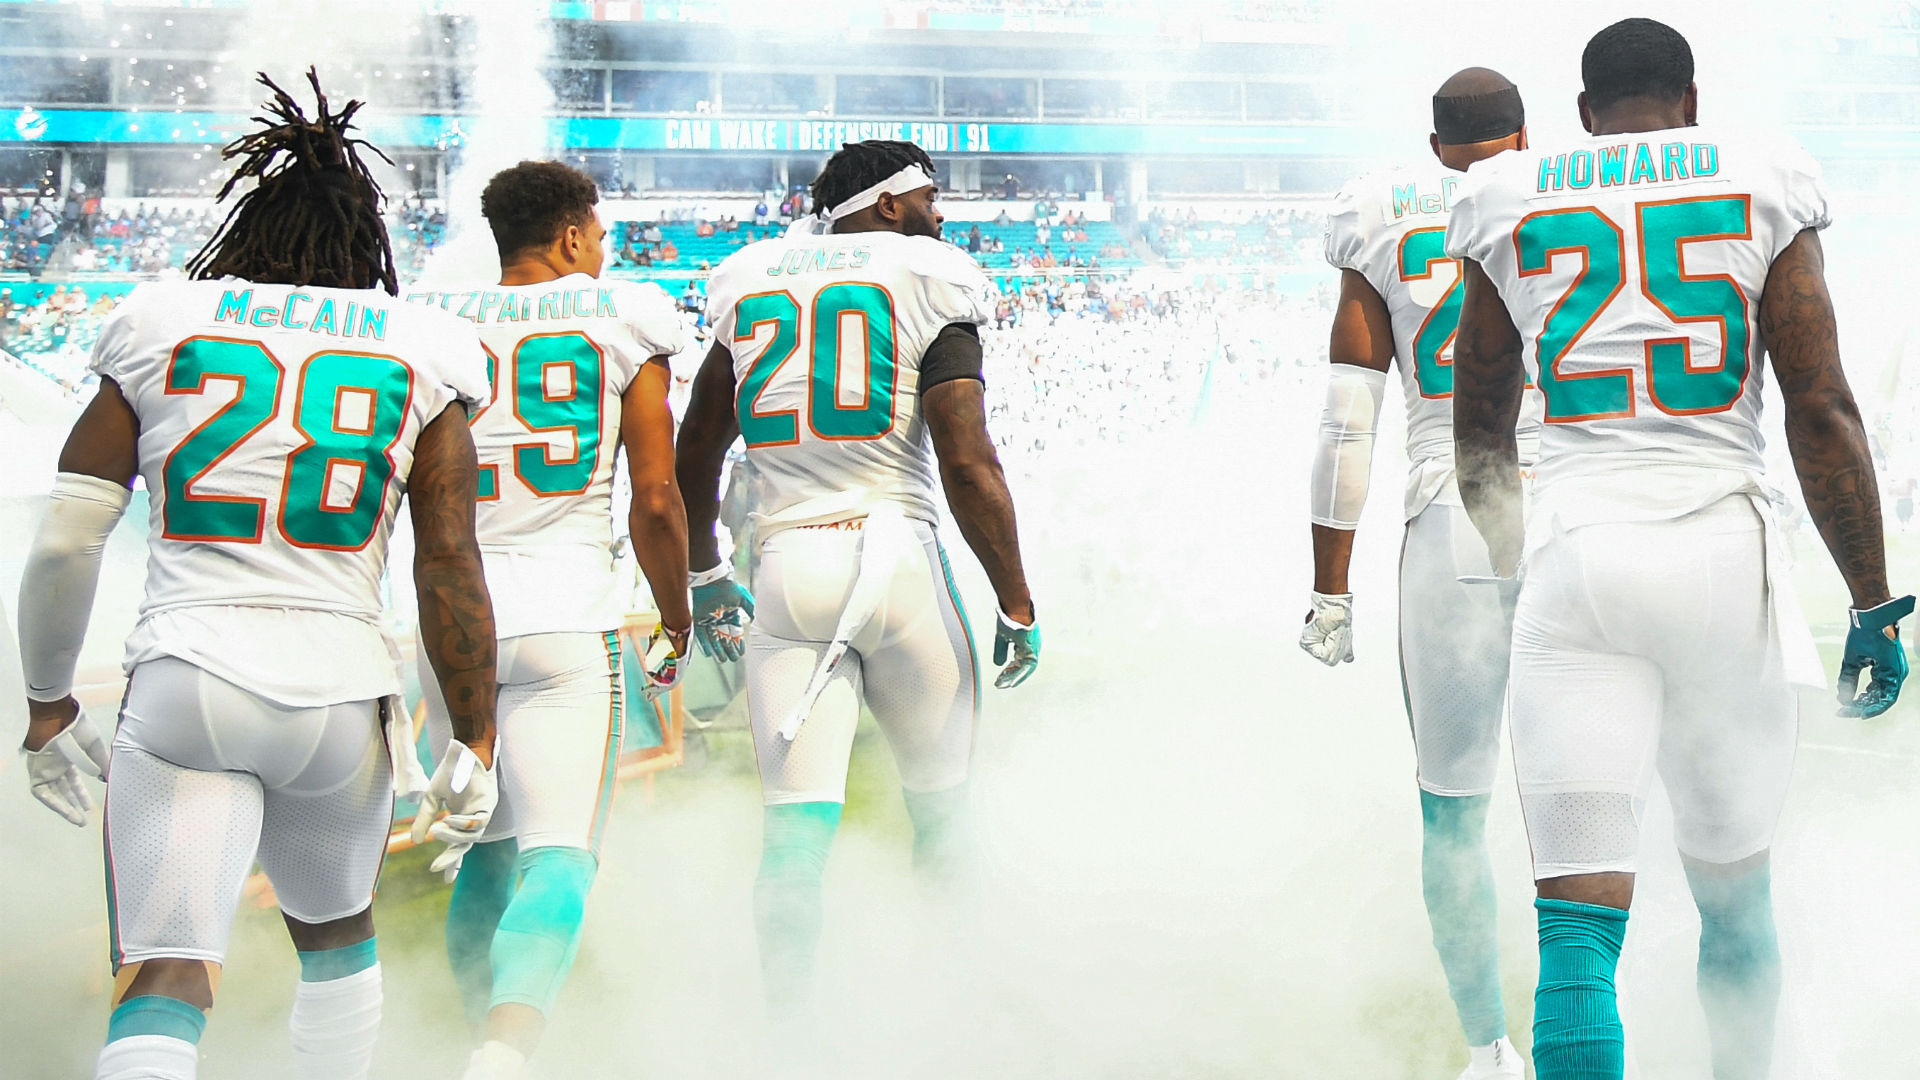 b3a6394e60b Dolphins depth chart 2019: Miami needs Josh Rosen to start, Christian  Wilkins to dominate ASAP | Sporting News